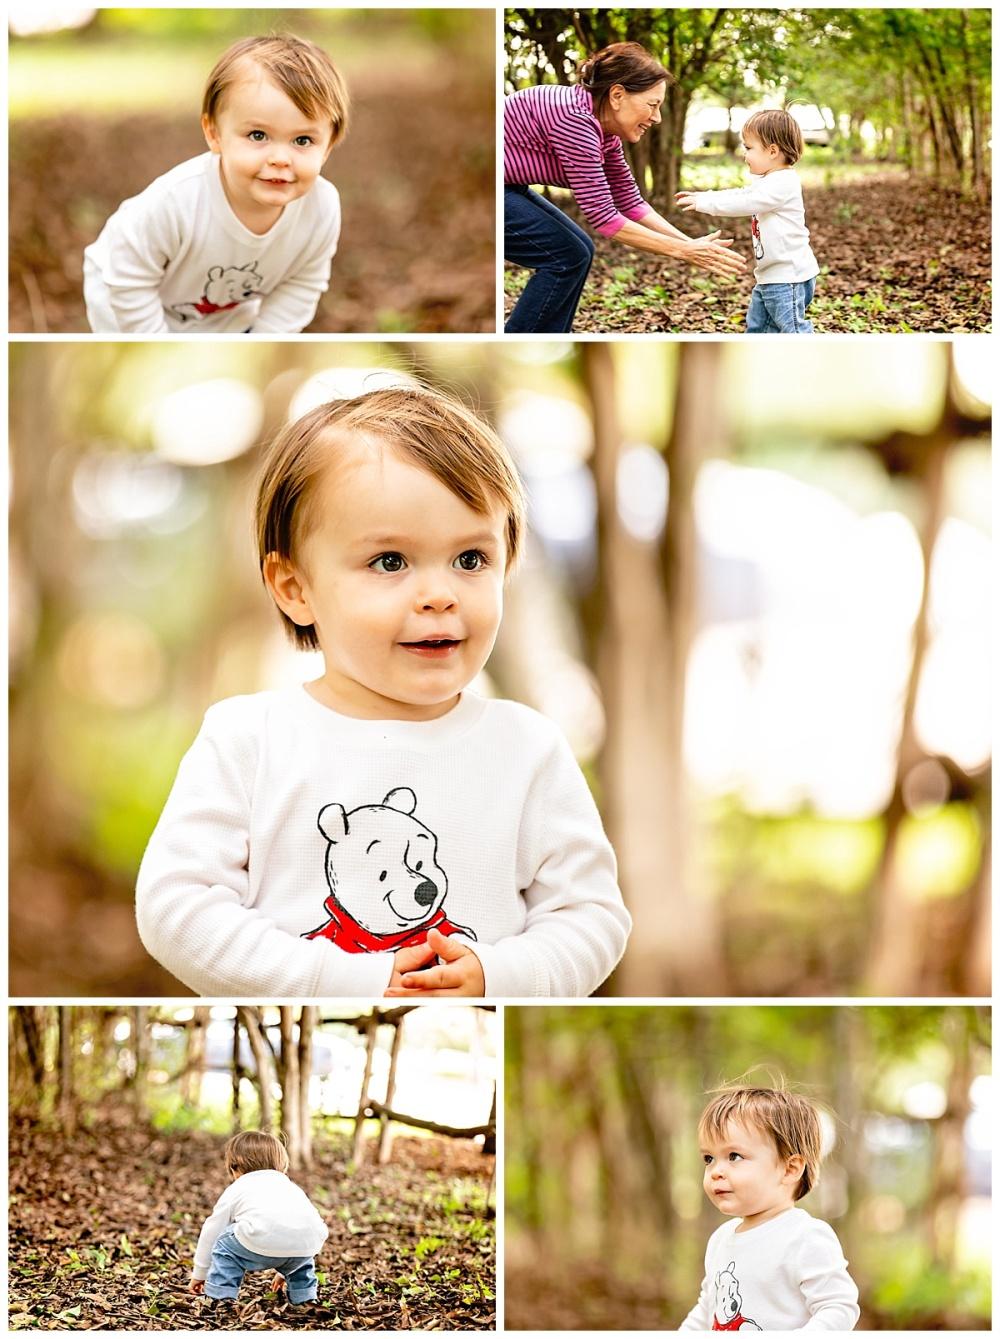 Family-Photographer-Gruene-Texas-Fall-Carly-Barton-Photography_0009.jpg